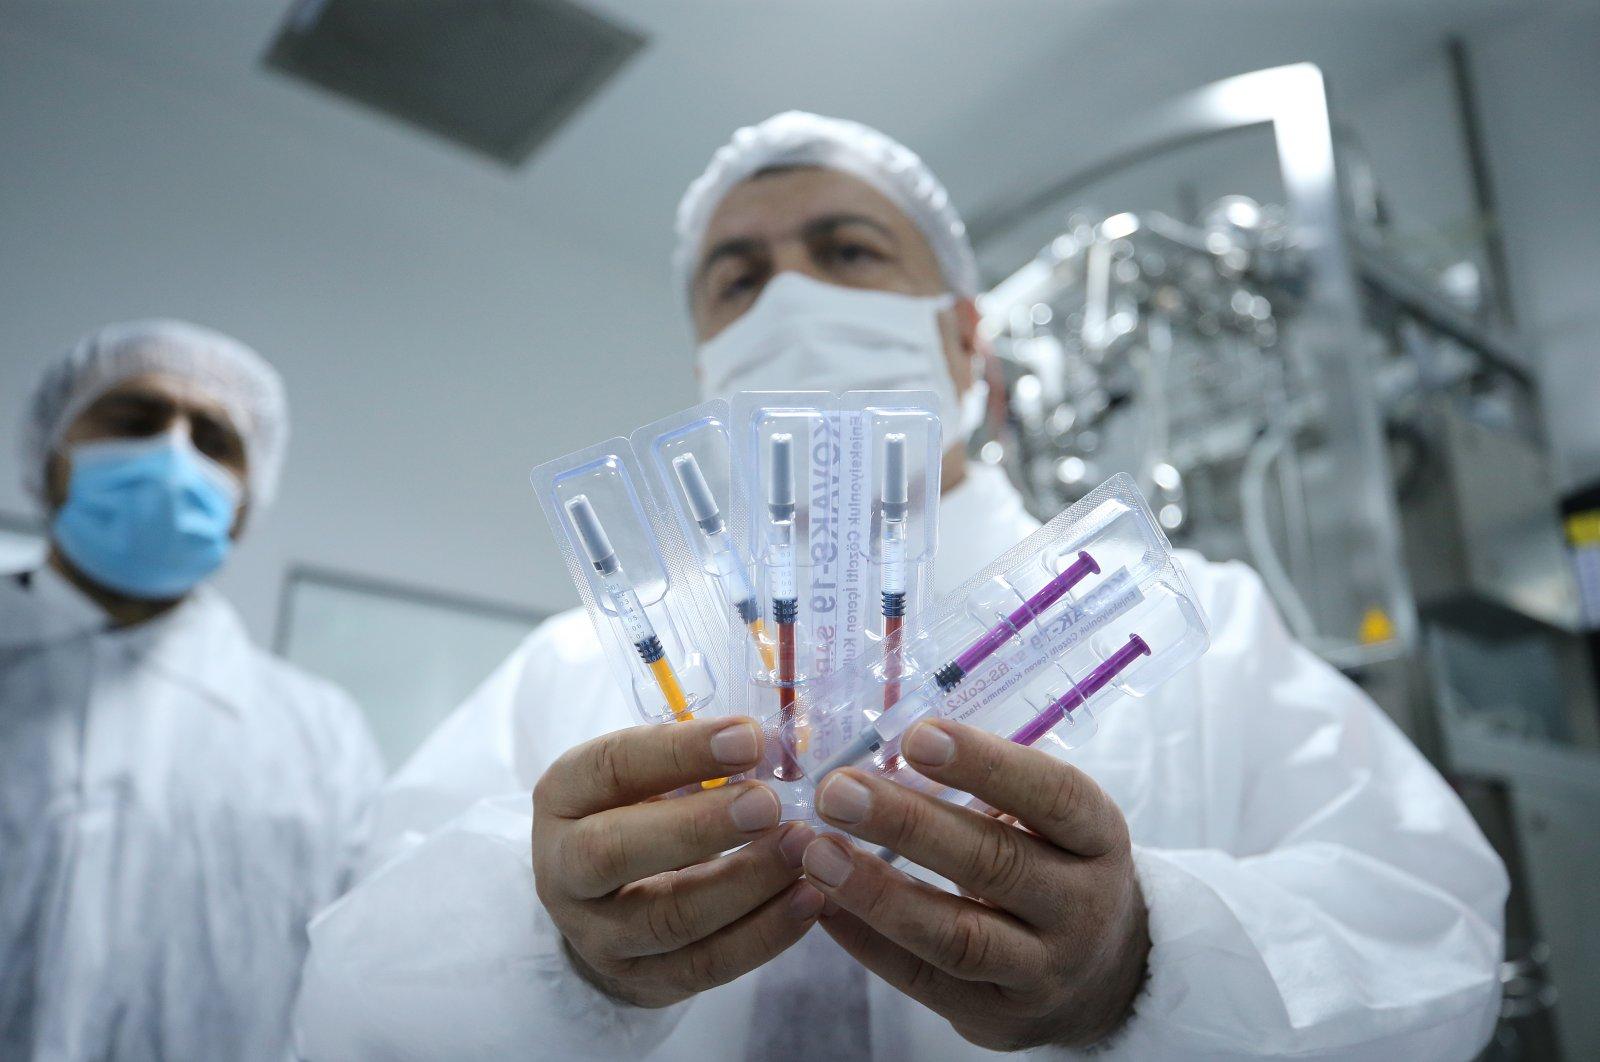 Health Minister Fahrettin Koca shows a vaccine in development by Koçak Farma company, in Tekirdağ, northwestern Turkey, Oct. 3, 2020. (AA Photo)